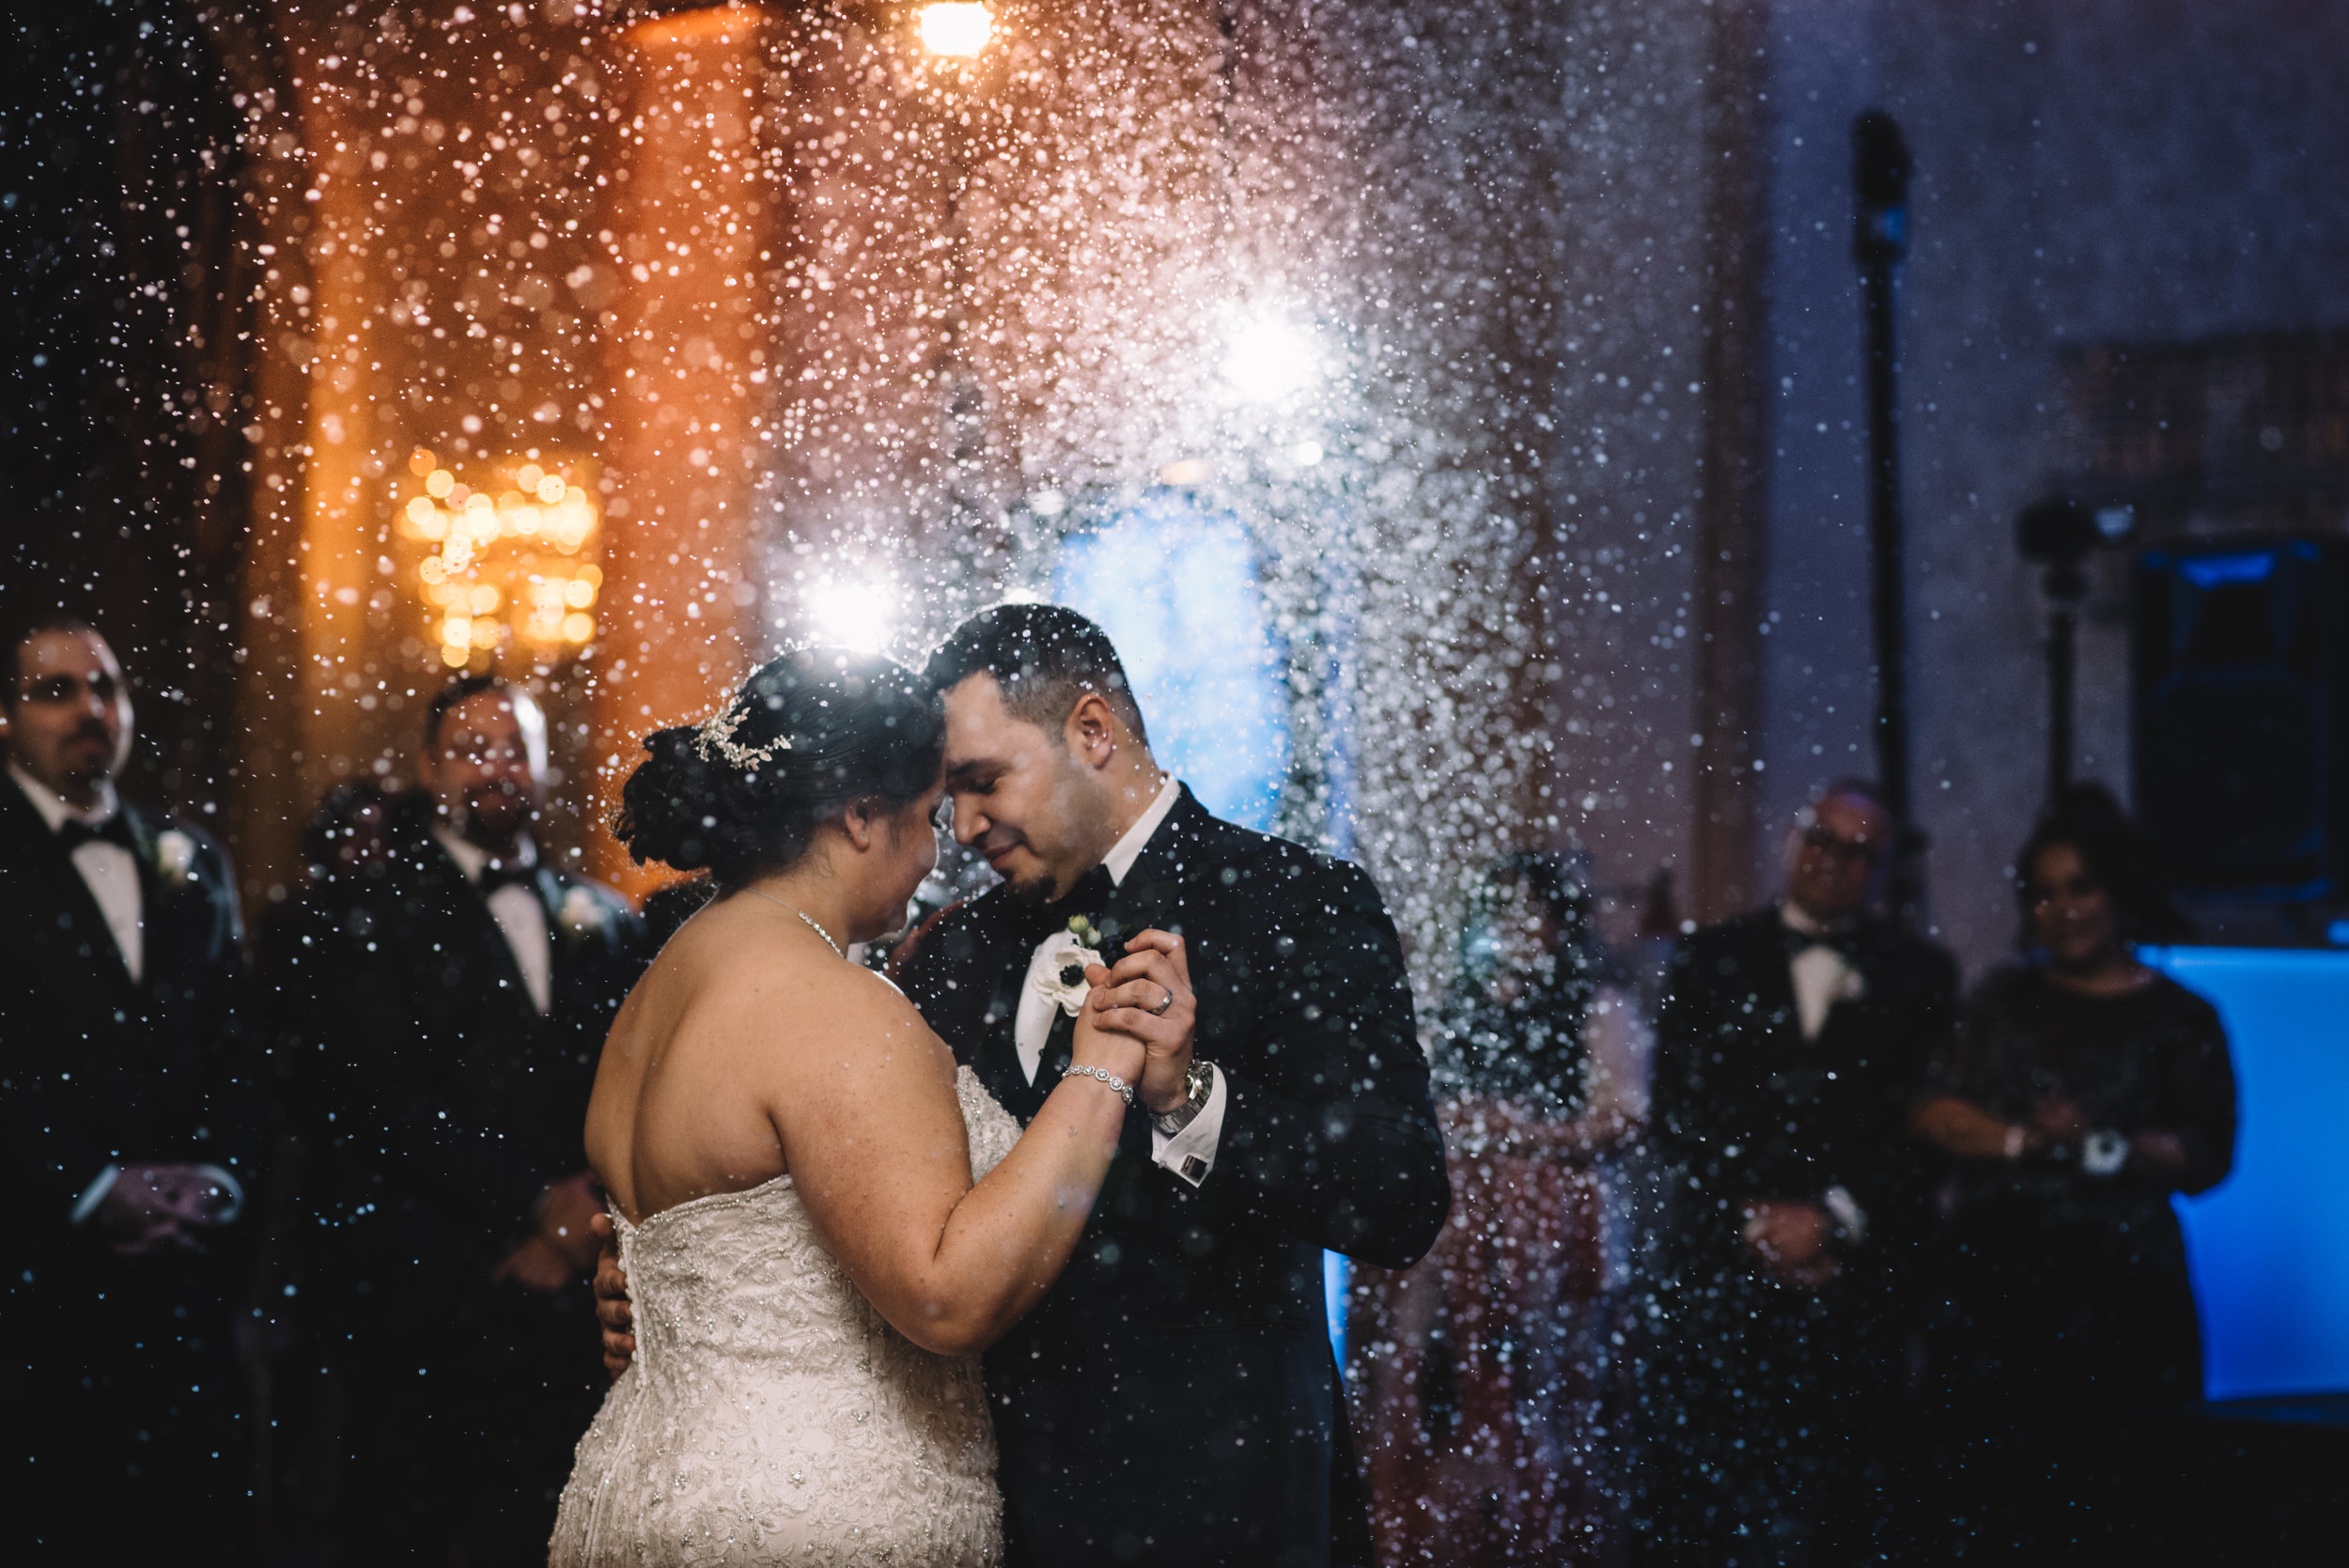 WeddingPhotos | NJPhotographer | Highlights-1-25.jpg